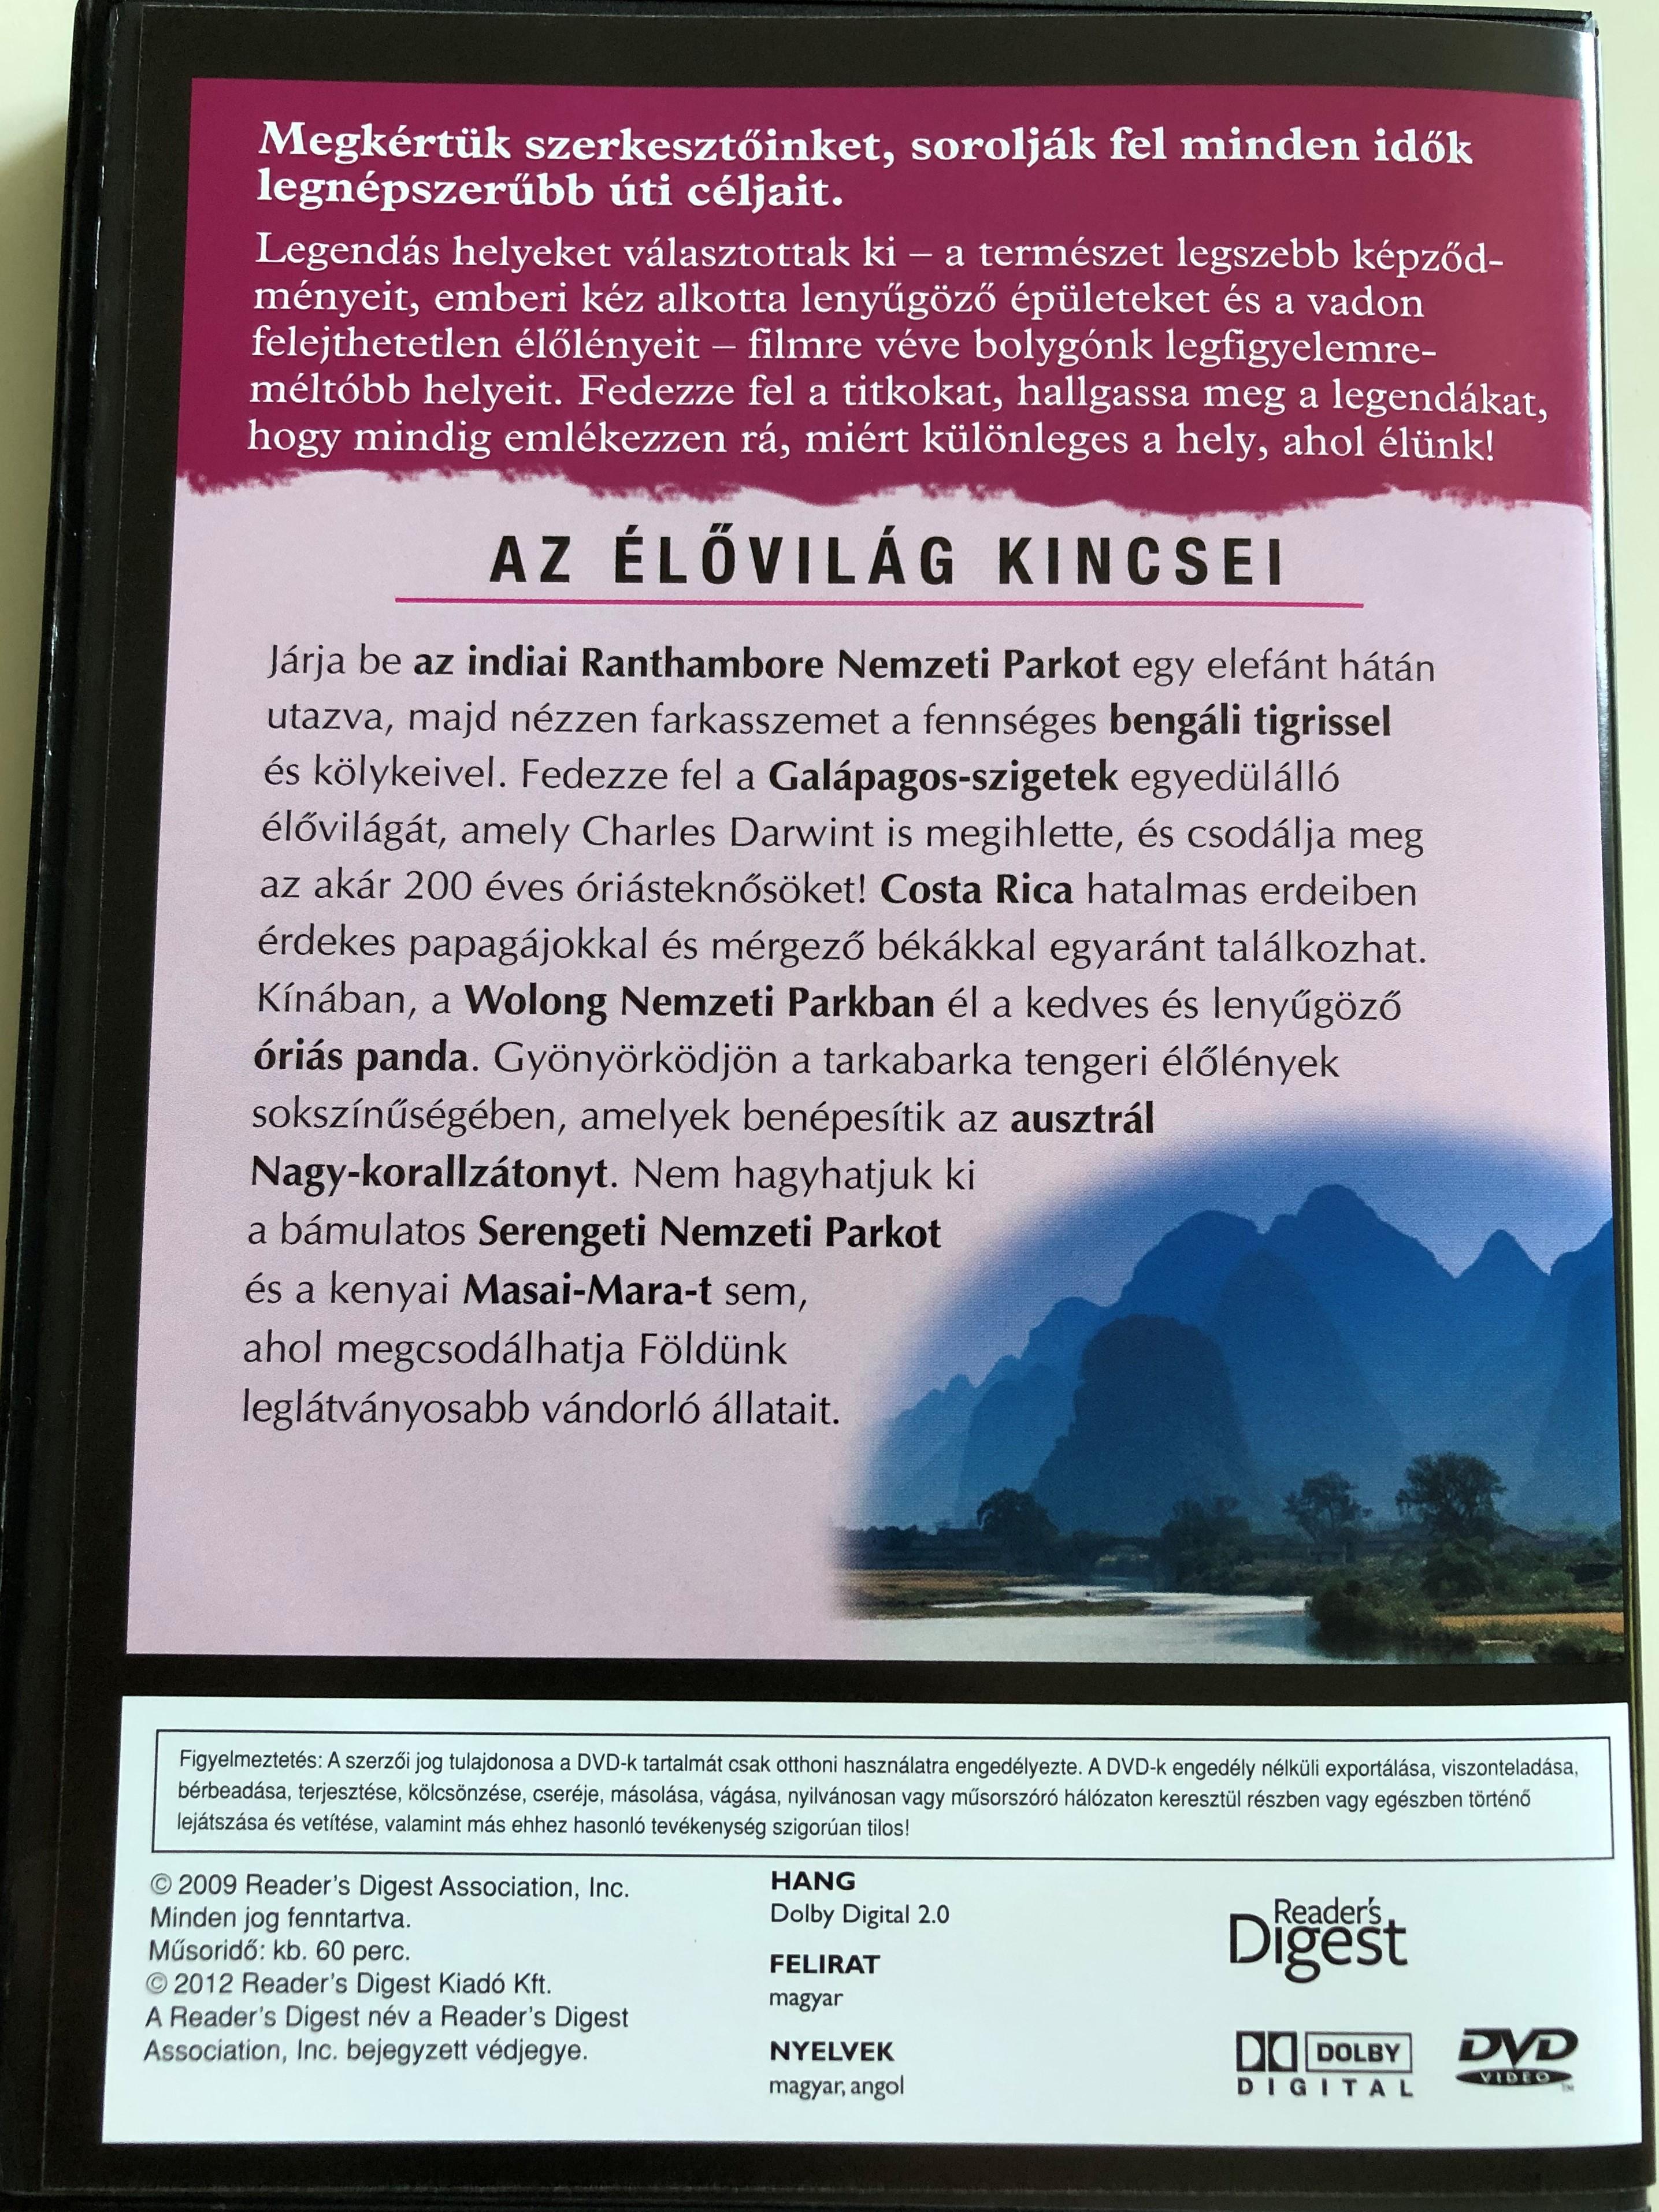 legendary-locations-treasures-dvd-2009-legend-s-helyek-amelyeket-l-tni-kell-az-l-vil-g-kincsei-reader-s-digest-narrated-by-josh-gates-2-.jpg